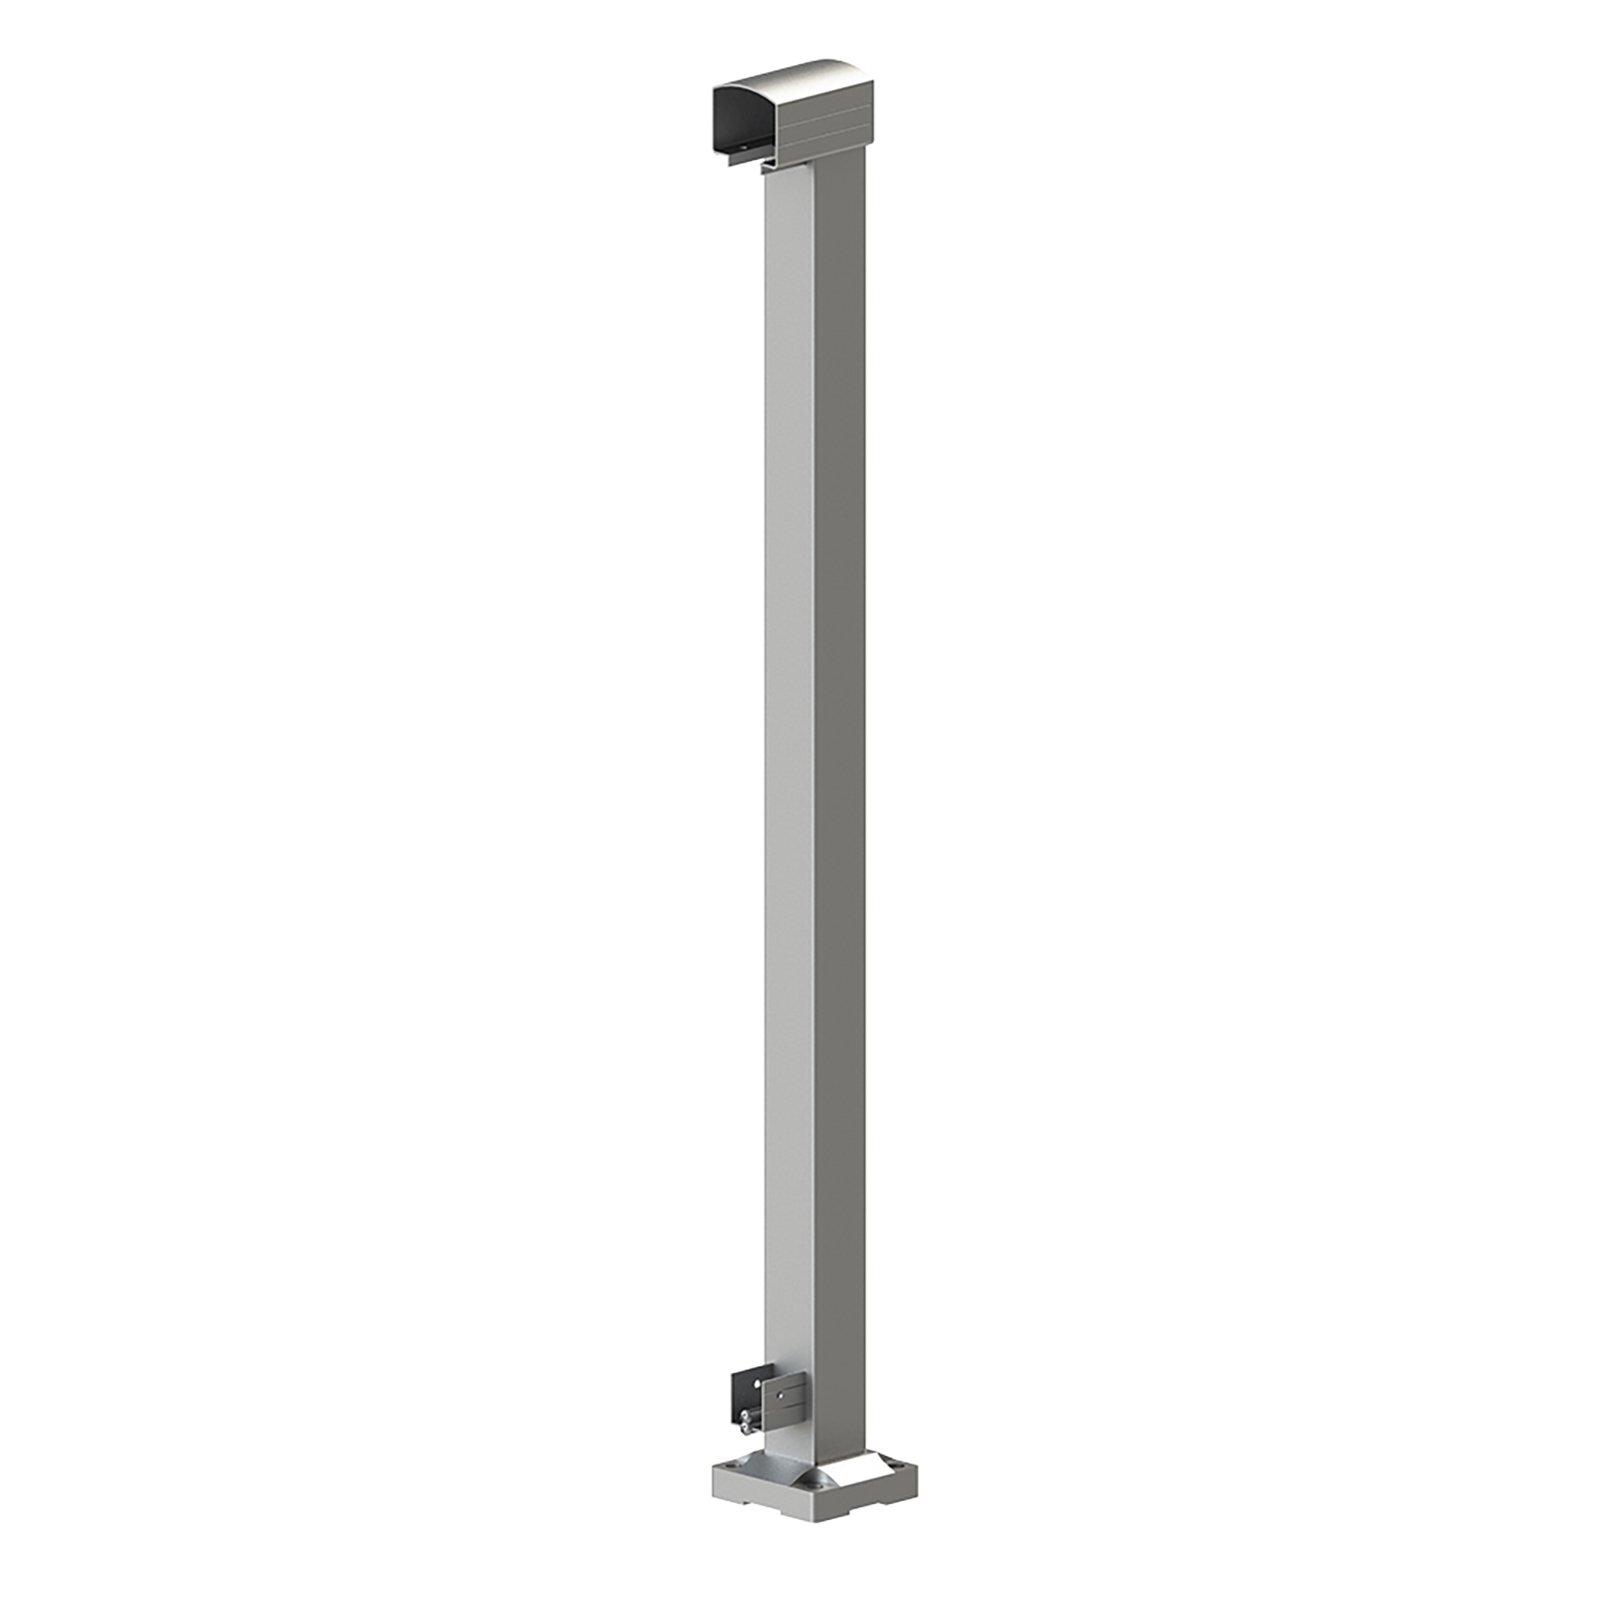 Peak Products 1000mm Silver Aluminium Balustrade End Post